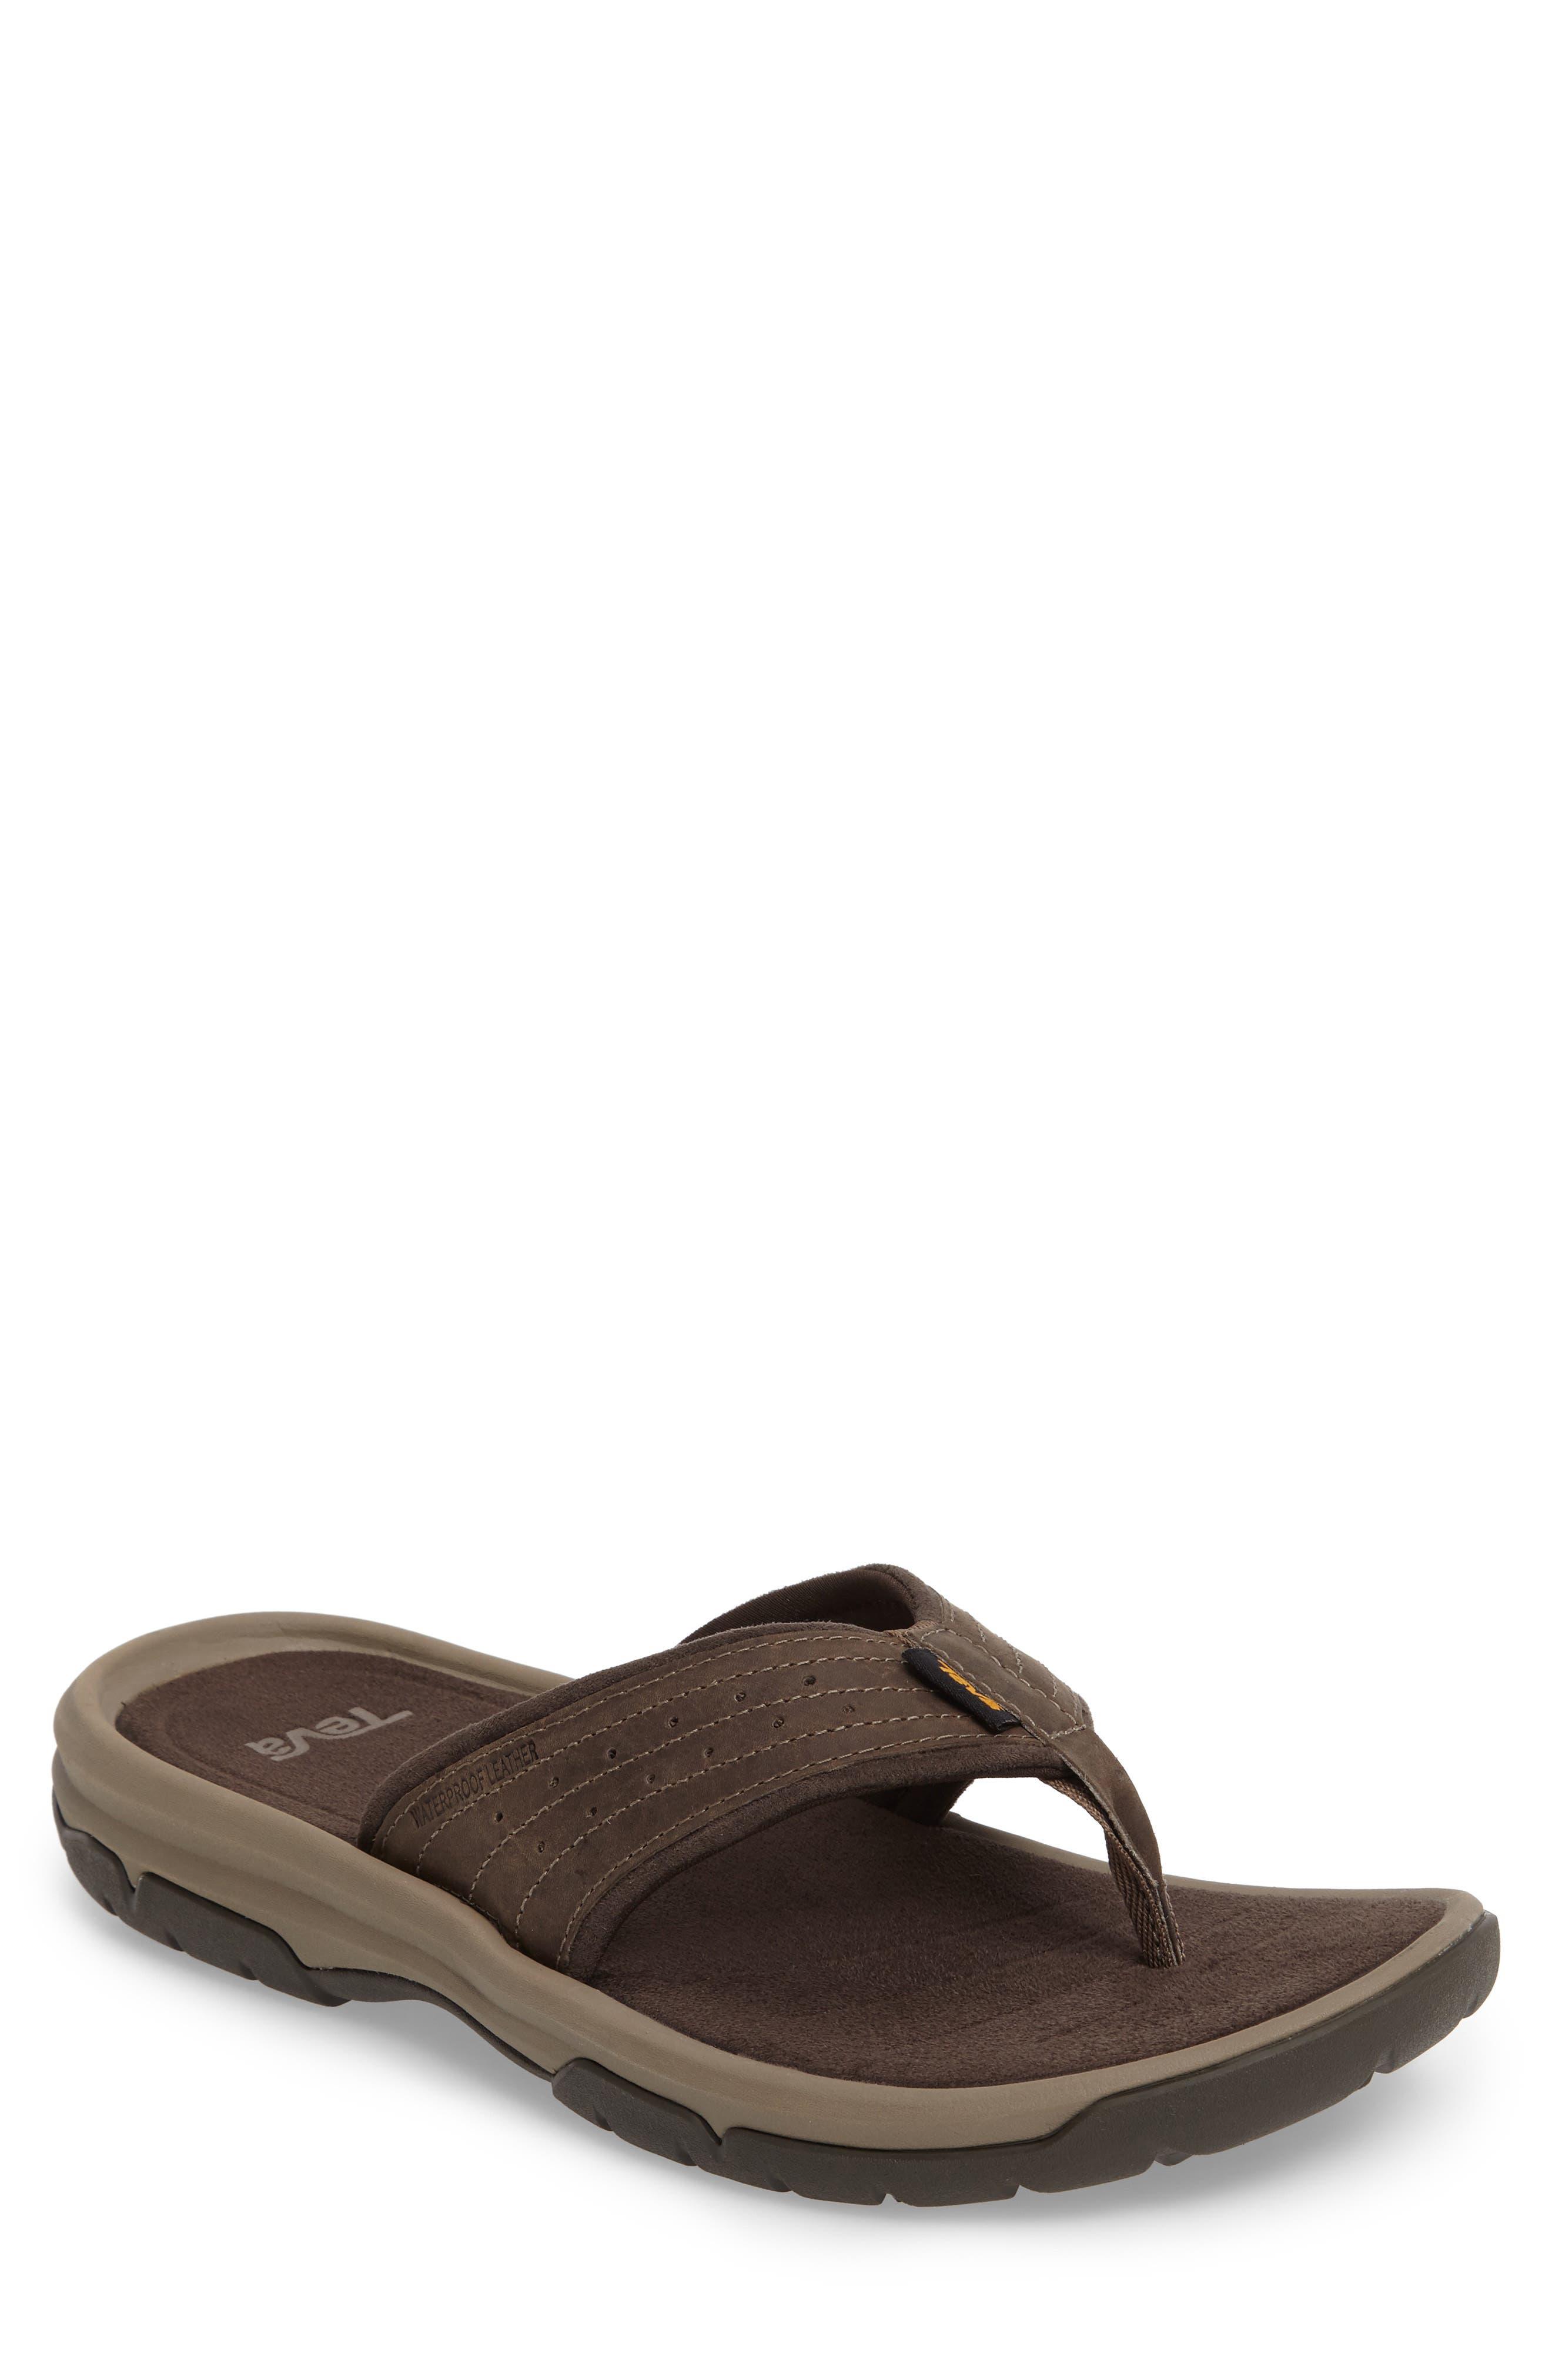 Langdon Flip Flop,                         Main,                         color, Walnut